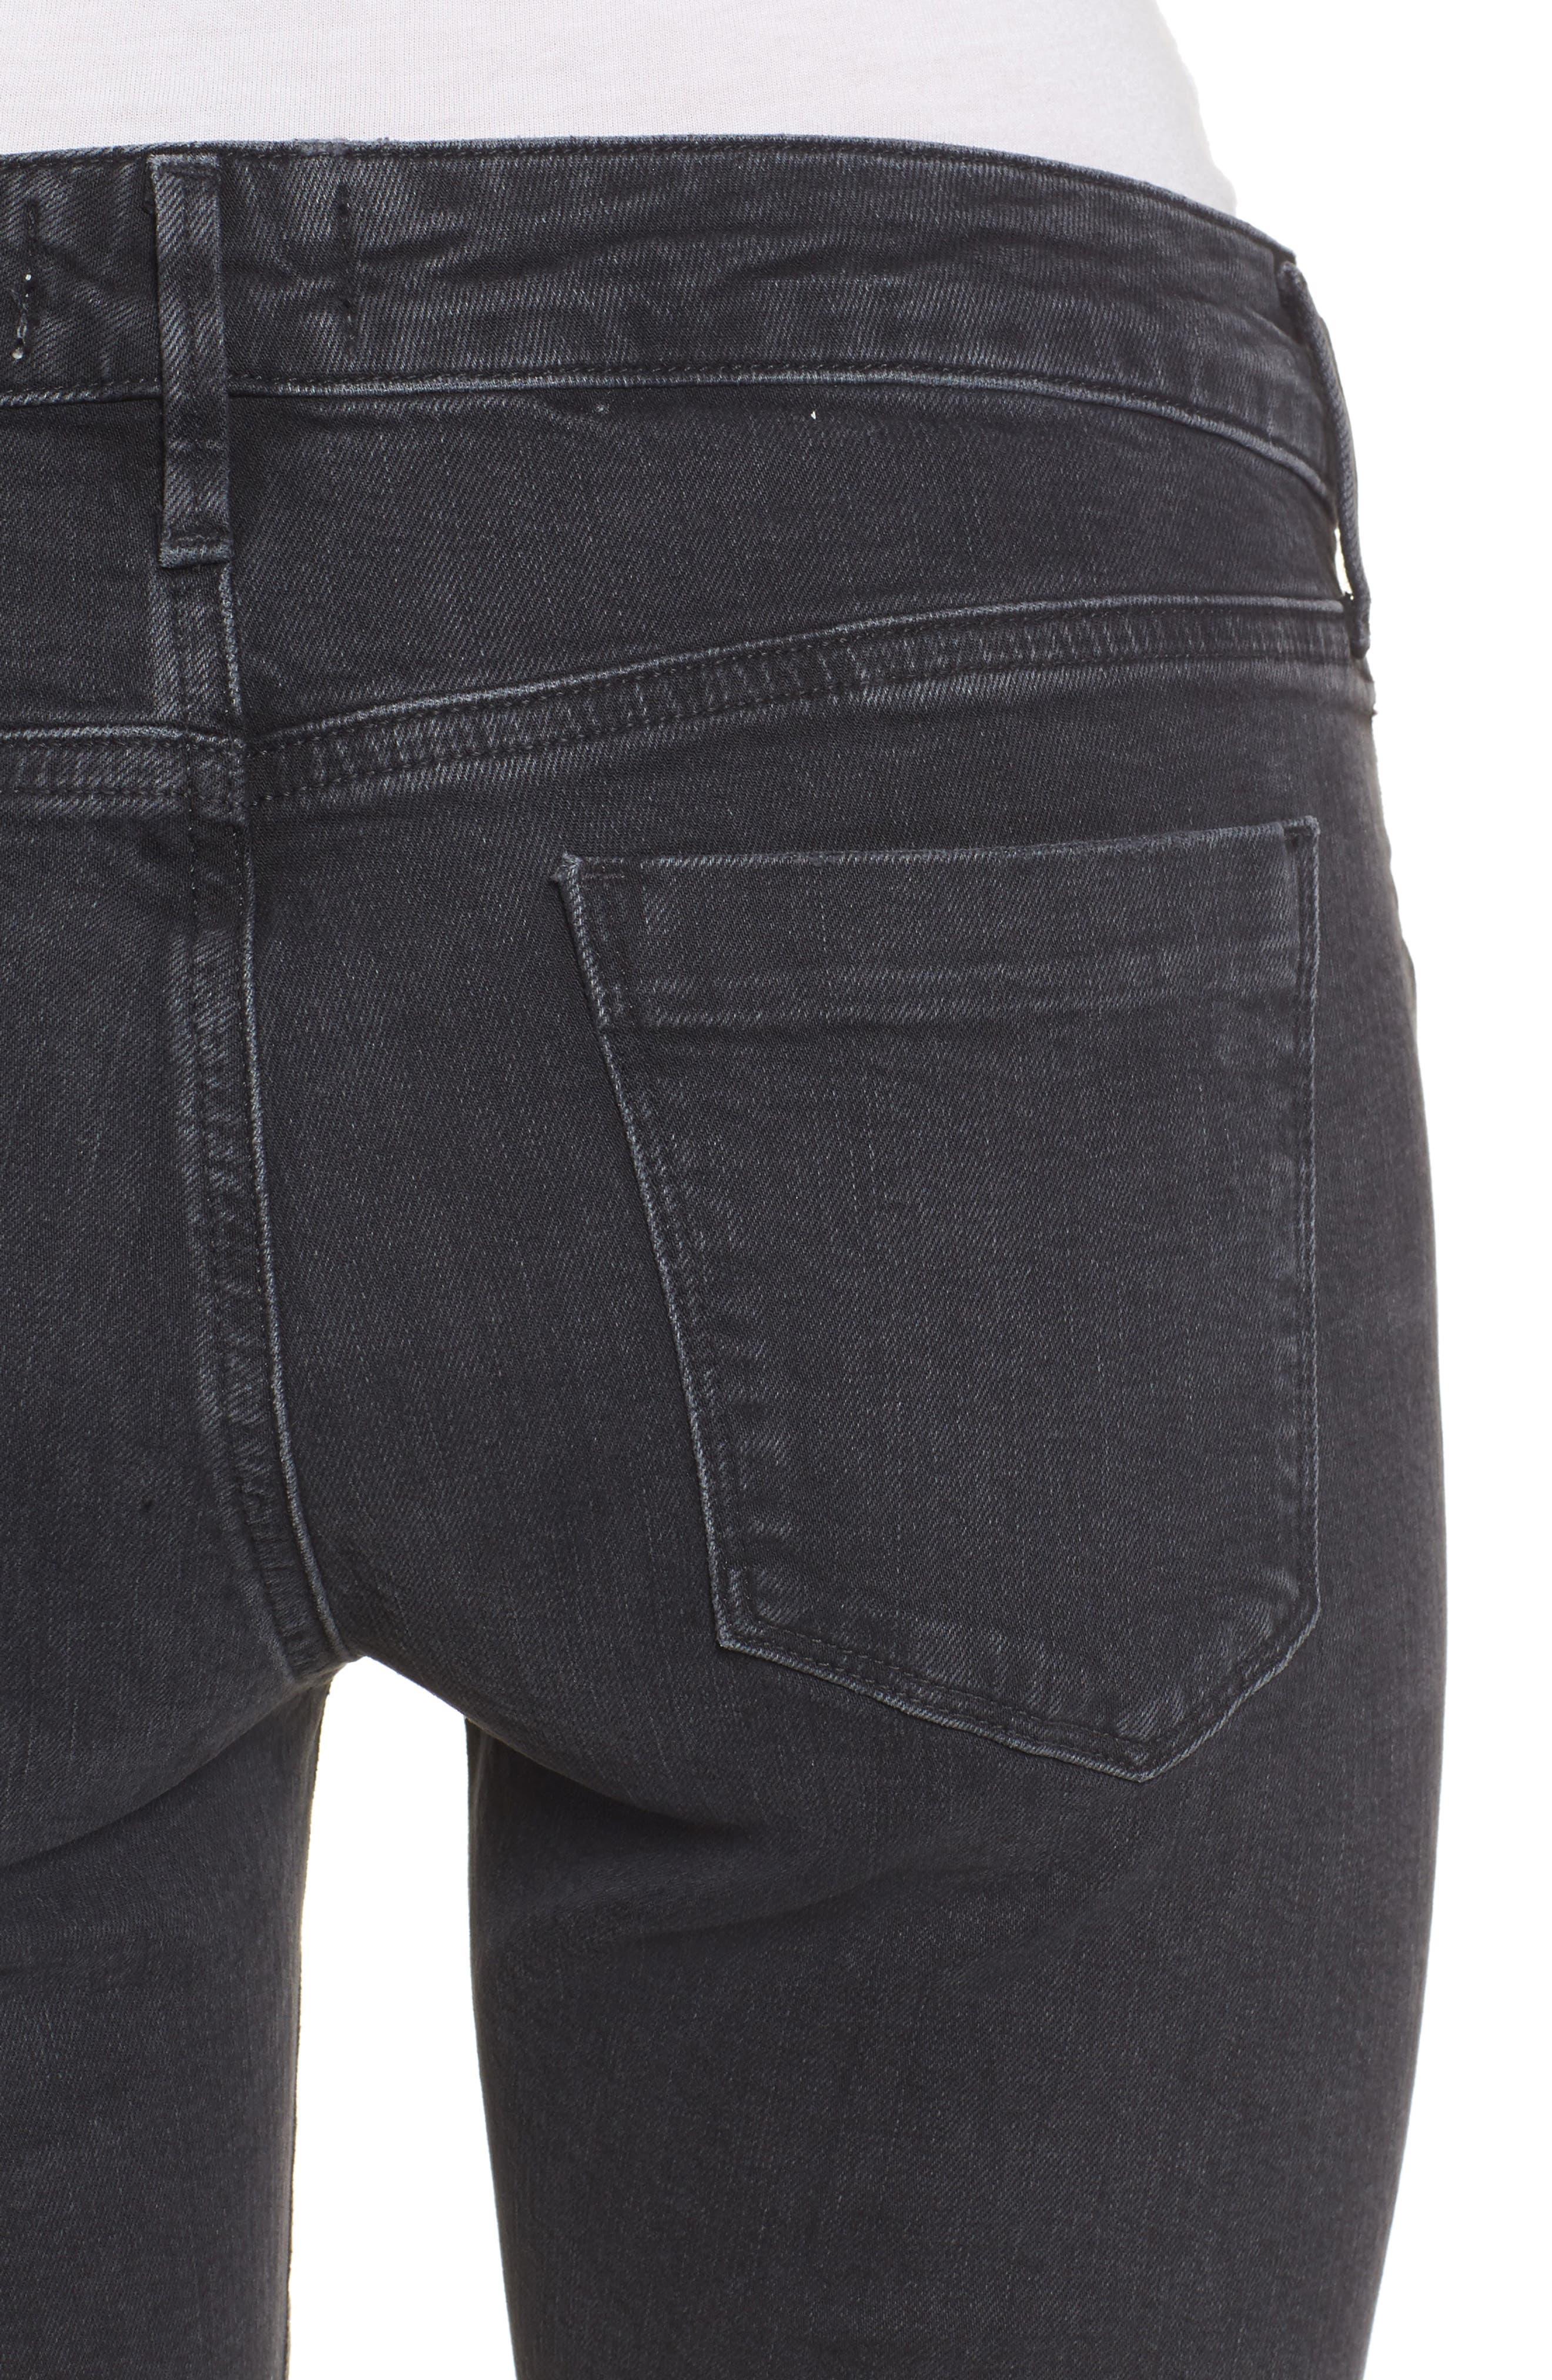 Chloe Low Rise Slim Jeans,                             Alternate thumbnail 4, color,                             072